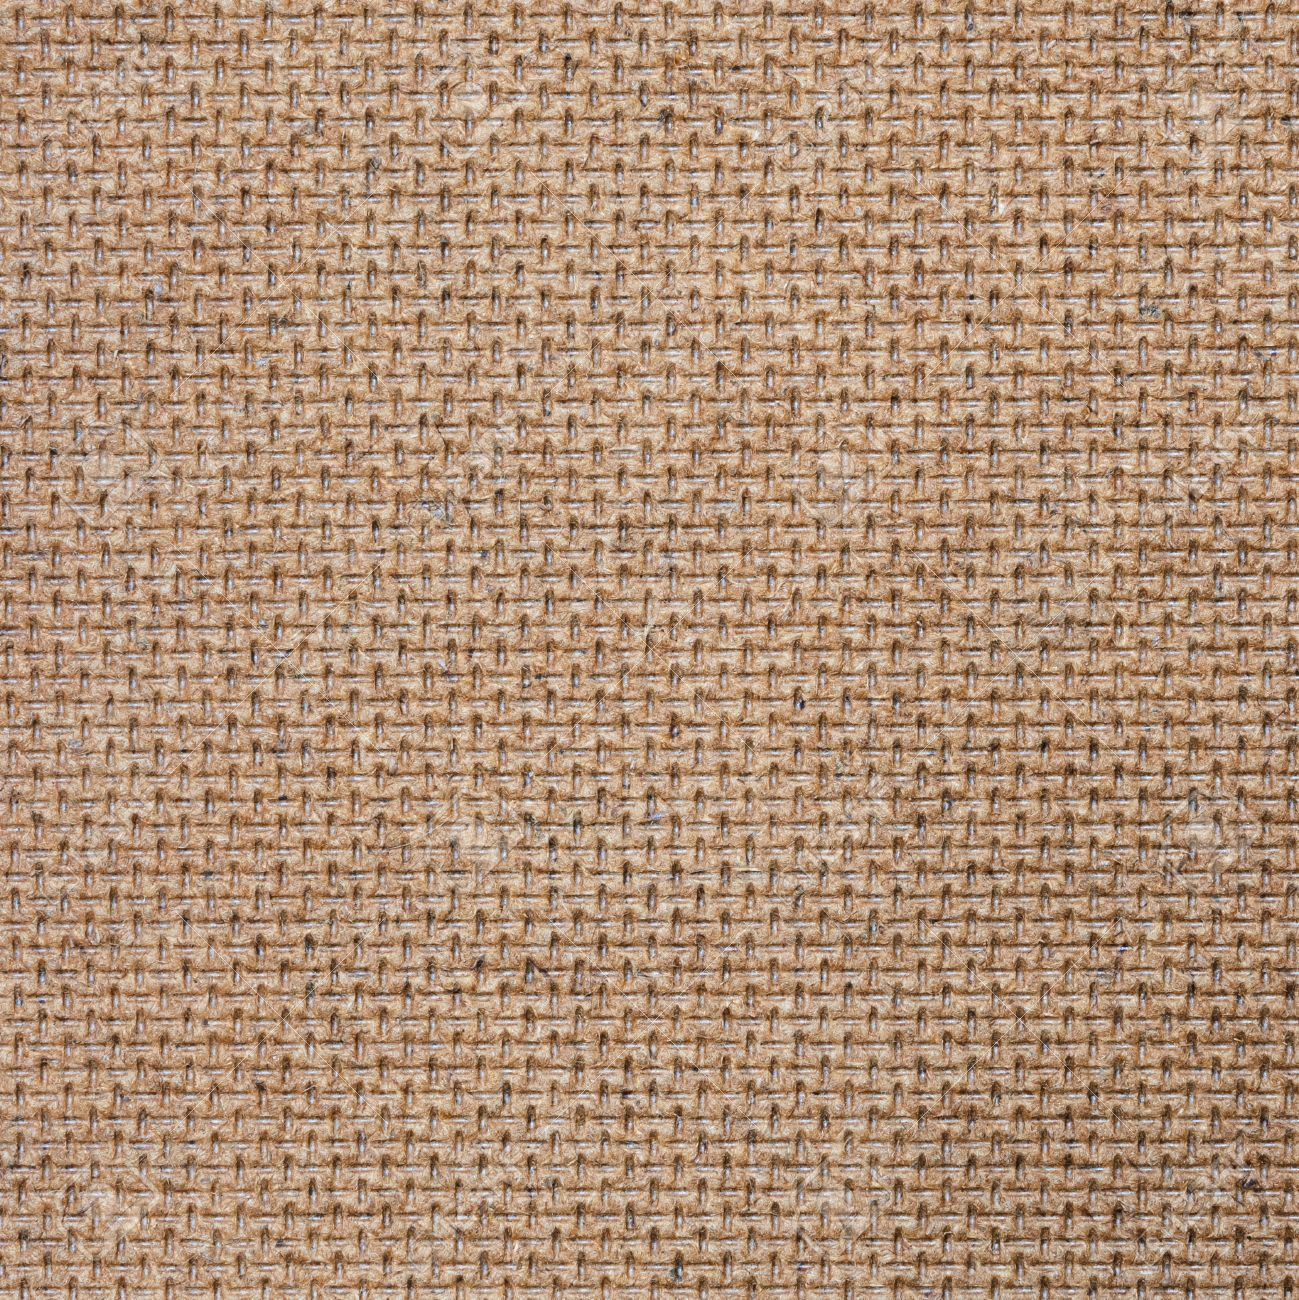 hardboard texture background back side of a masonite board stock